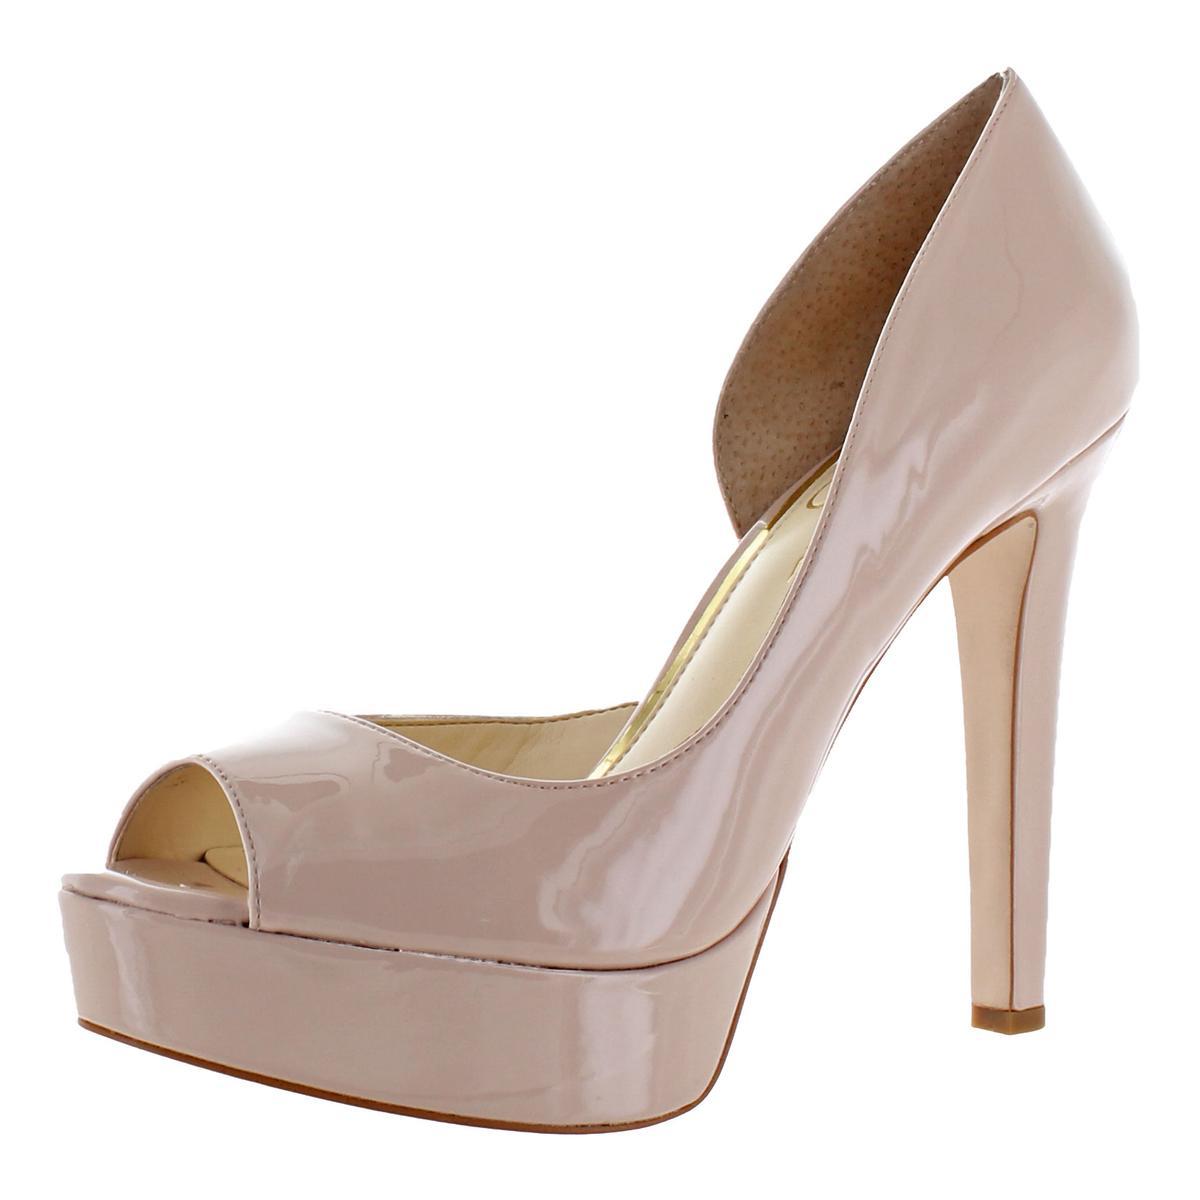 Jessica-Simpson-Martella-Women-039-s-Almond-Peep-Toe-Stiletto-d-039-Orsay-Heels-Shoes thumbnail 2